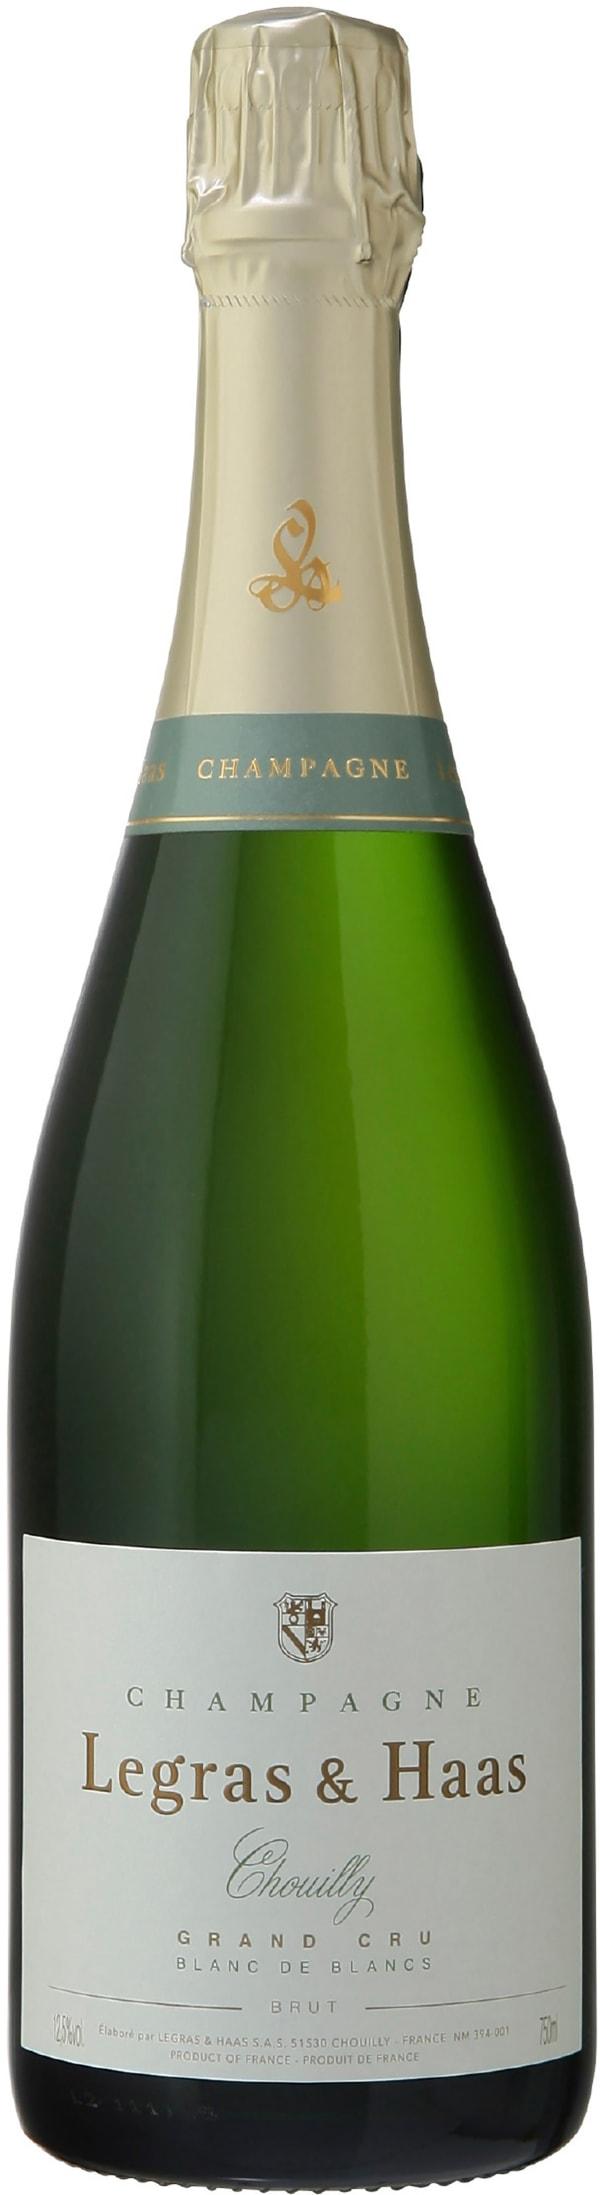 Legras & Haas Grand Cru Blanc de Blanc Champagne Brut